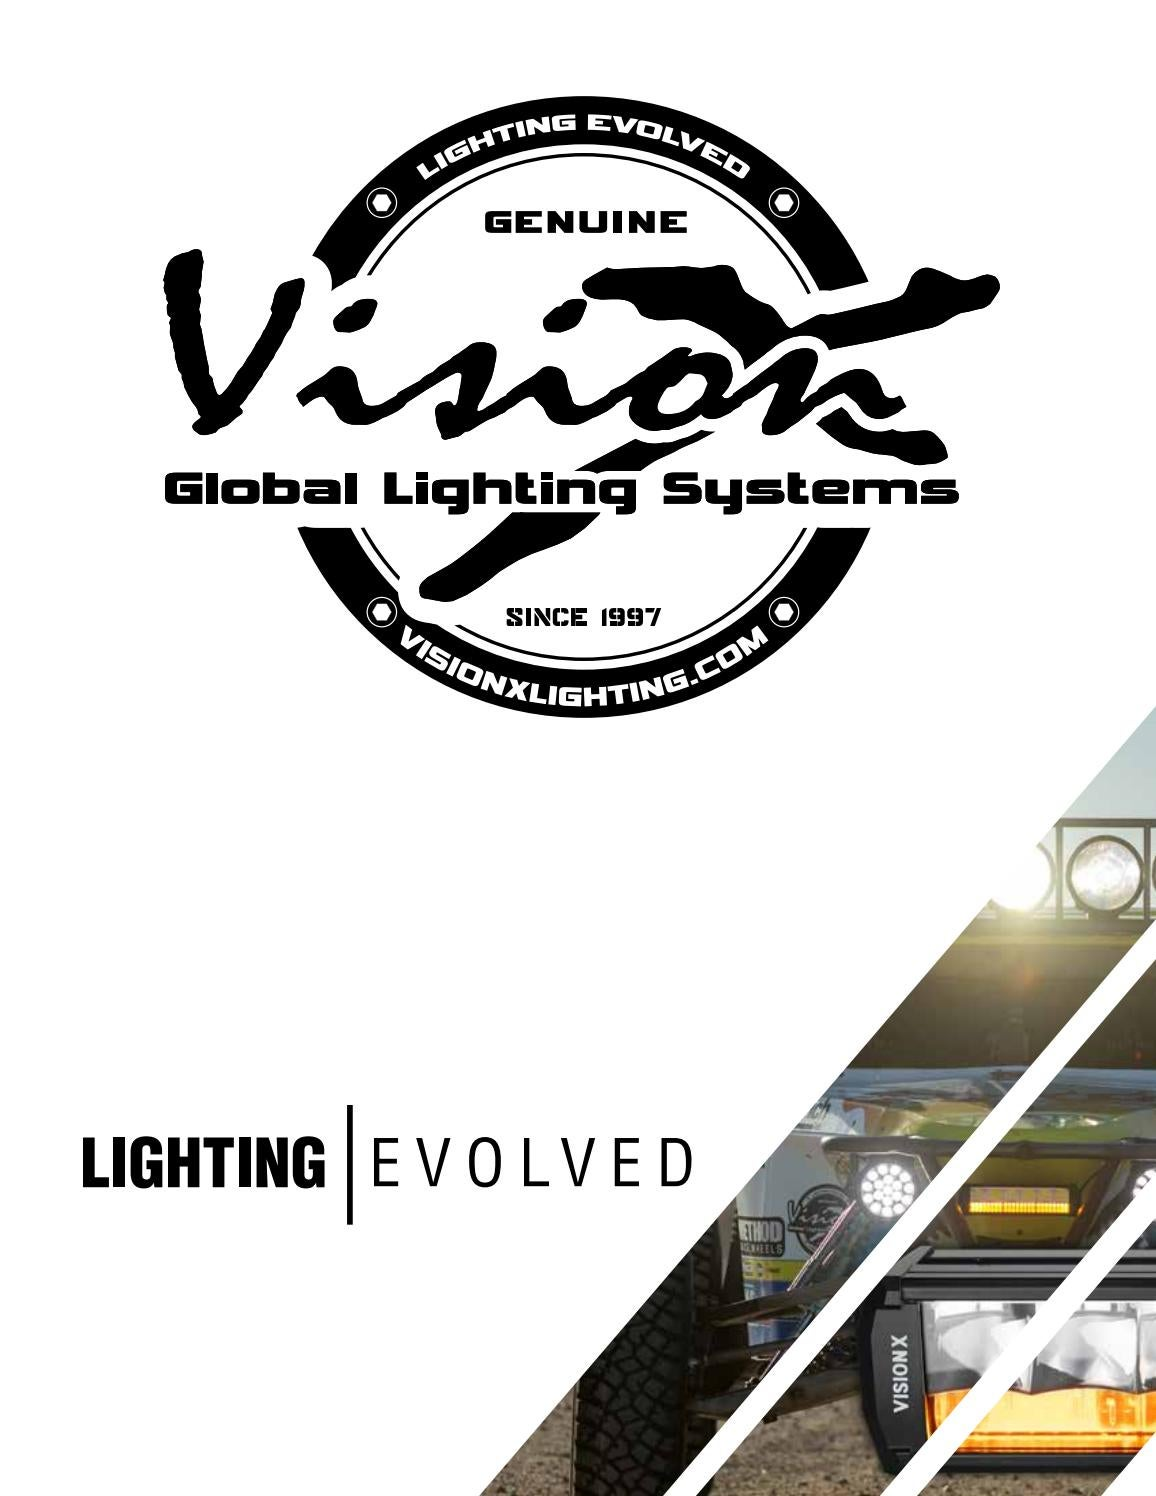 Vision X Lighting CG2-CPM310KIT CG2 Mini Light Cannon Series 3.7 3 LED Light Pair//Including Harness